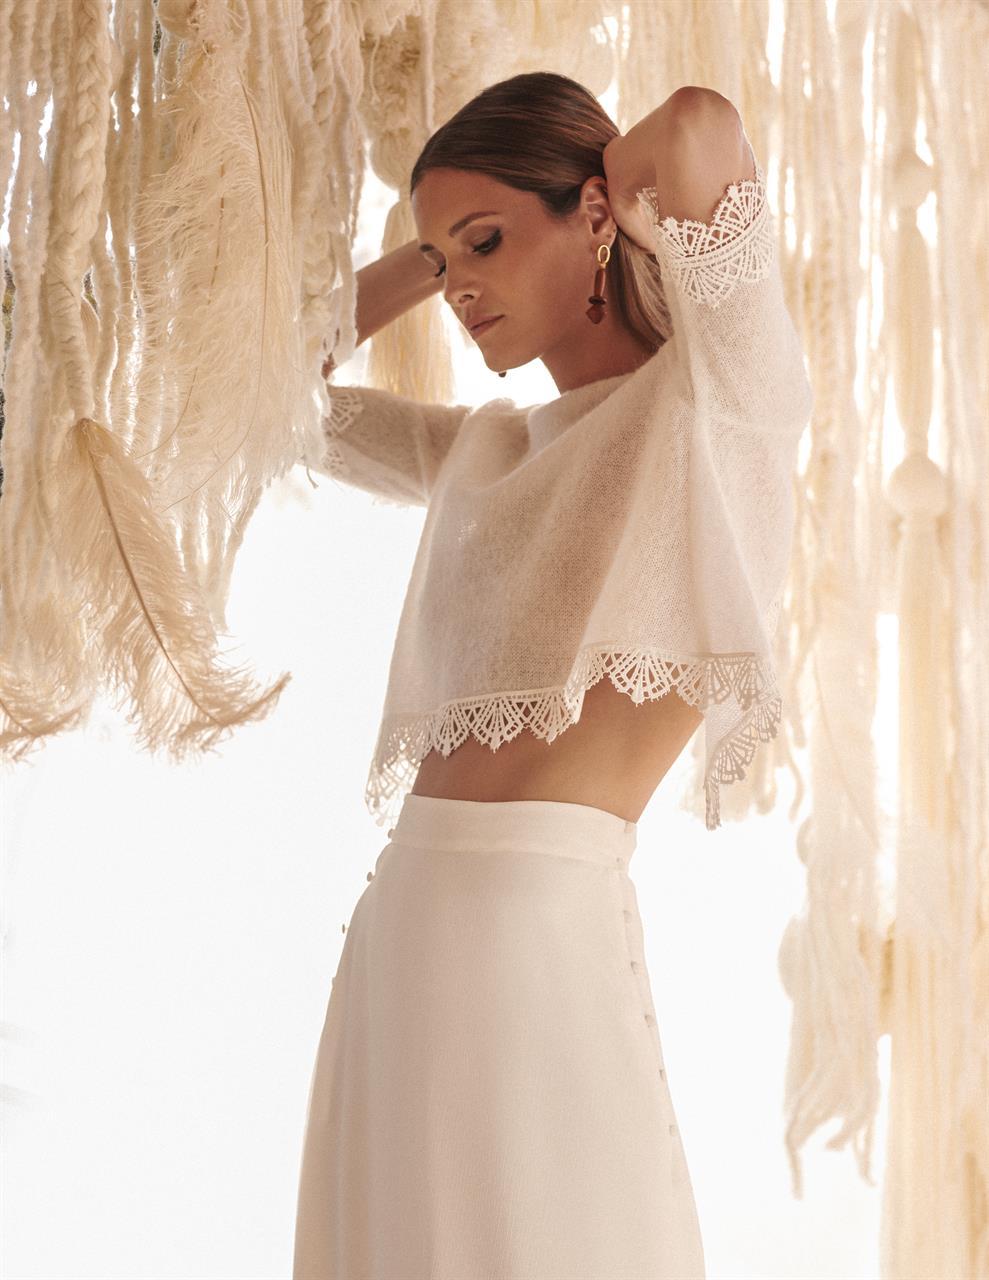 Marylise-2020-Eris Top + Halia Skirt-1-lr